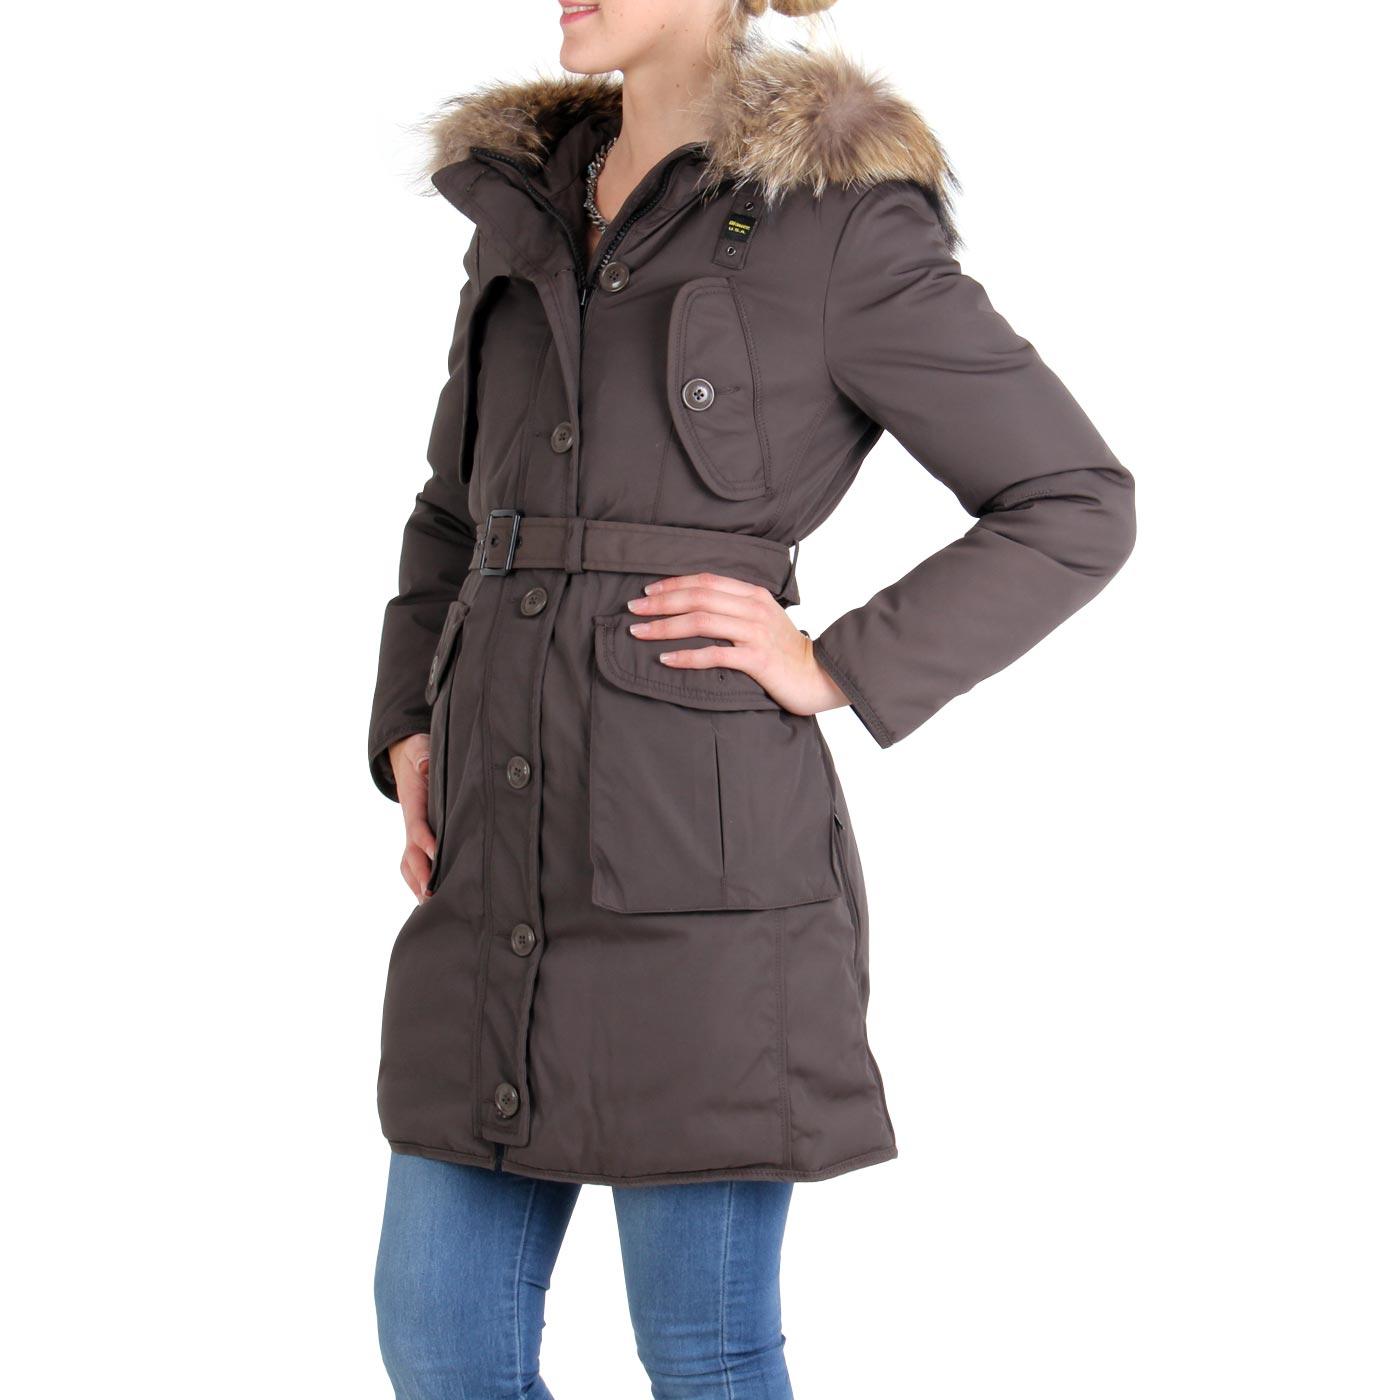 blauer usa damen winter daunen parka mantel jacke brown. Black Bedroom Furniture Sets. Home Design Ideas